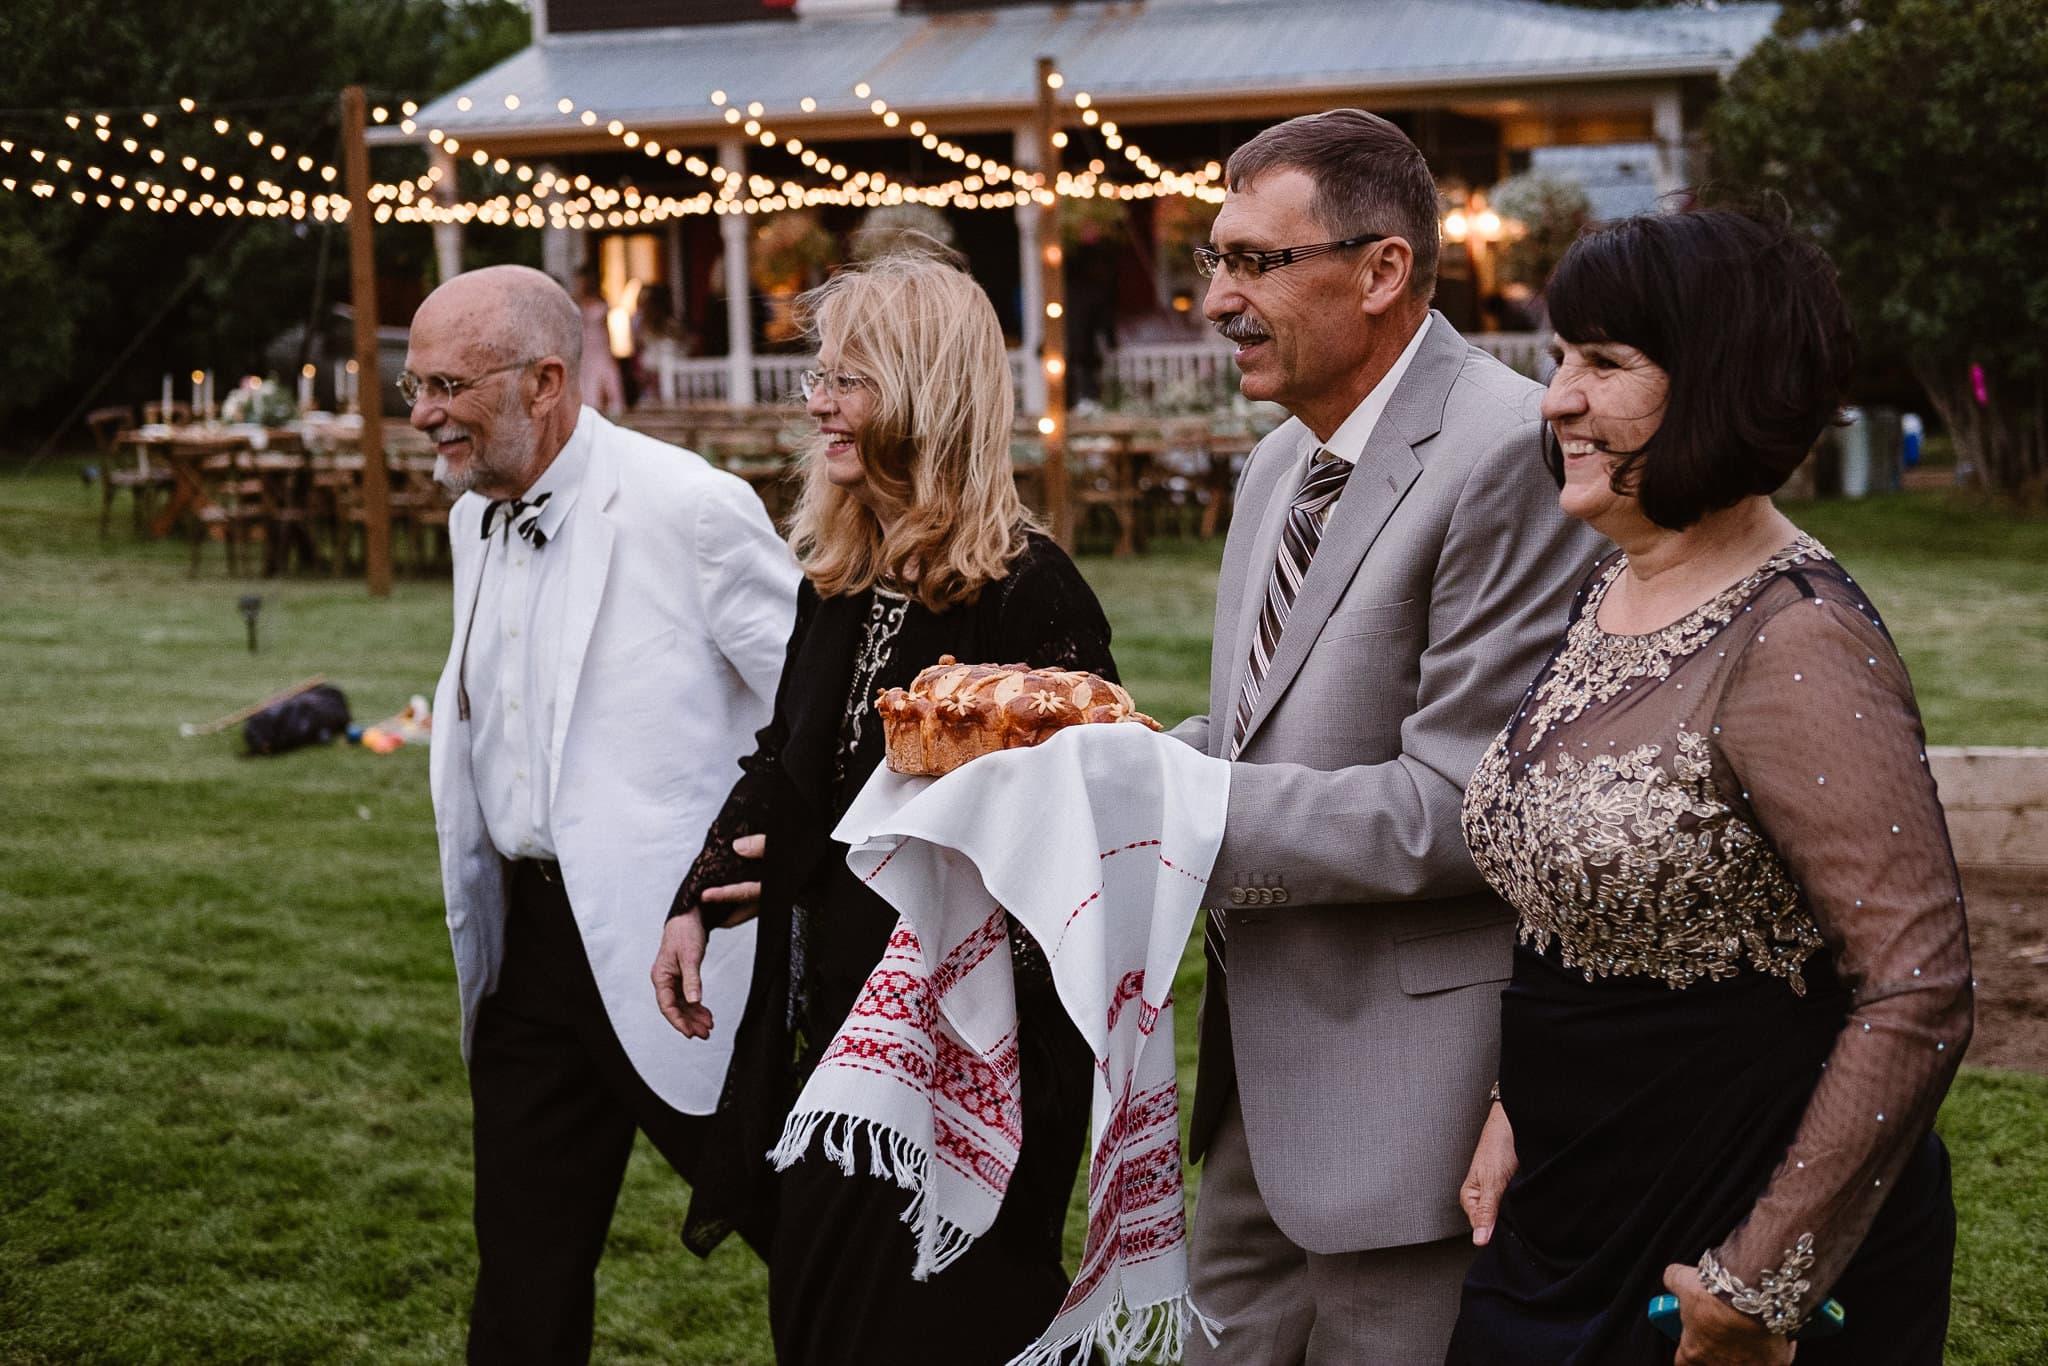 Aspen ranch wedding, Colorado mountain wedding photographer, private ranch wedding reception, Russian wedding bread loaf with salt